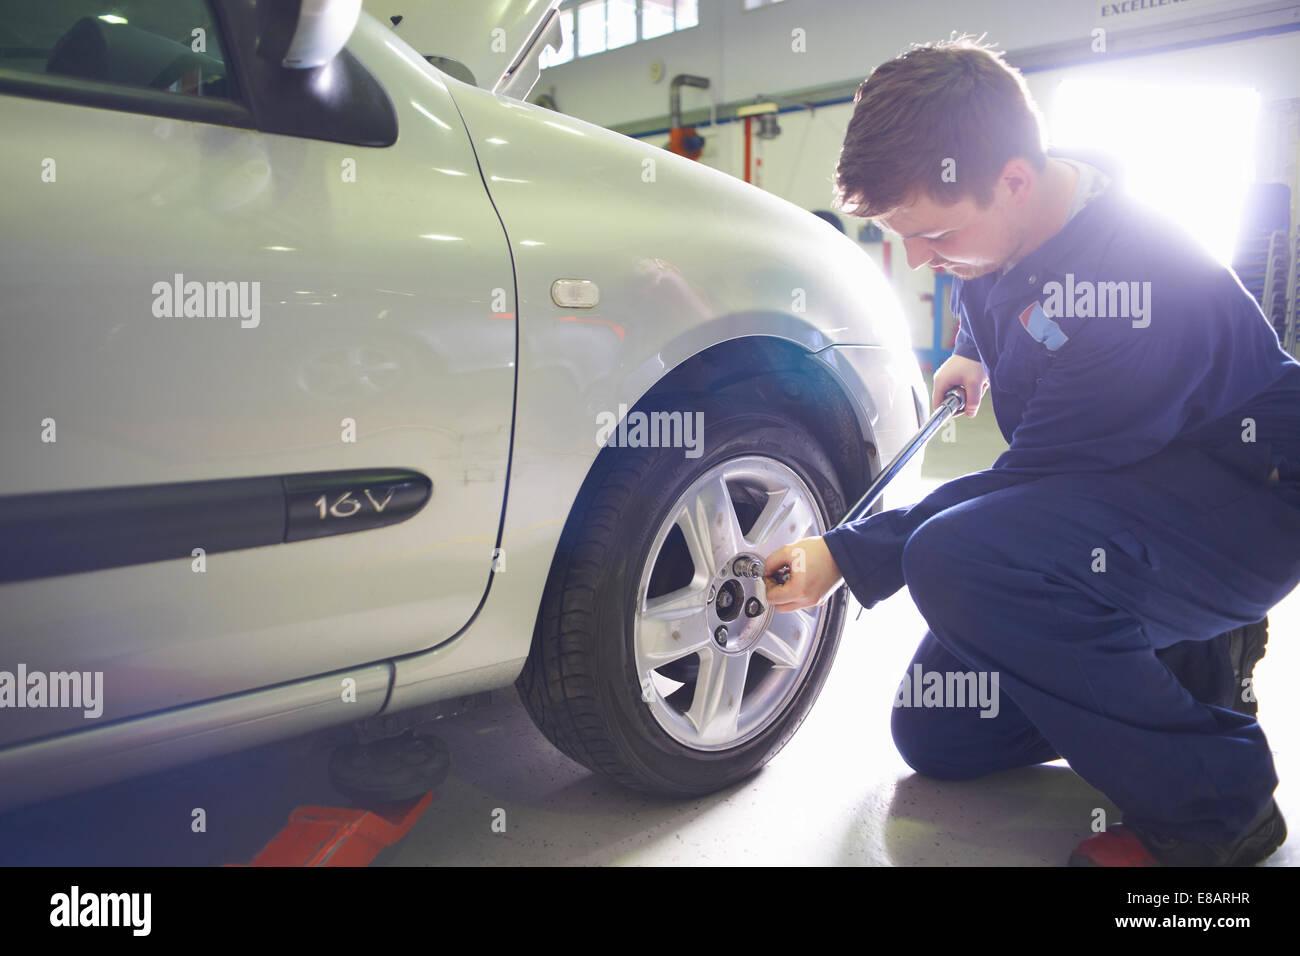 Male student mechanic tightening car wheel in college garage - Stock Image